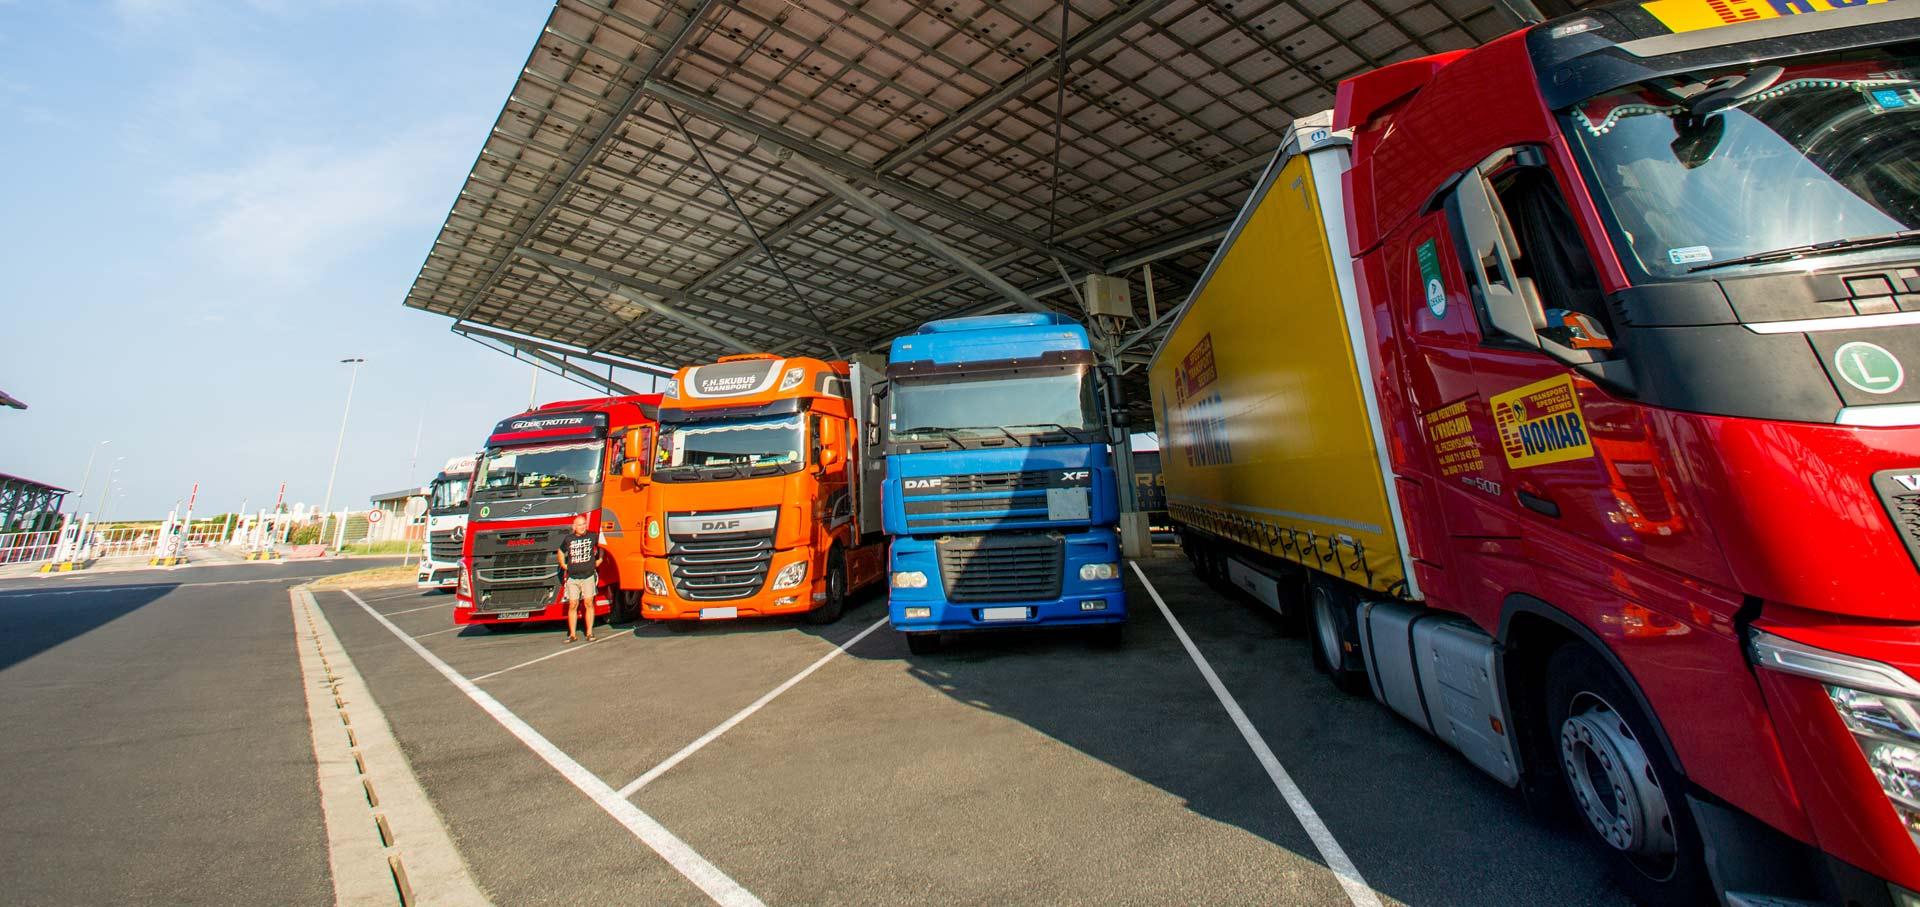 truck-etape-beziers-reservation-parking